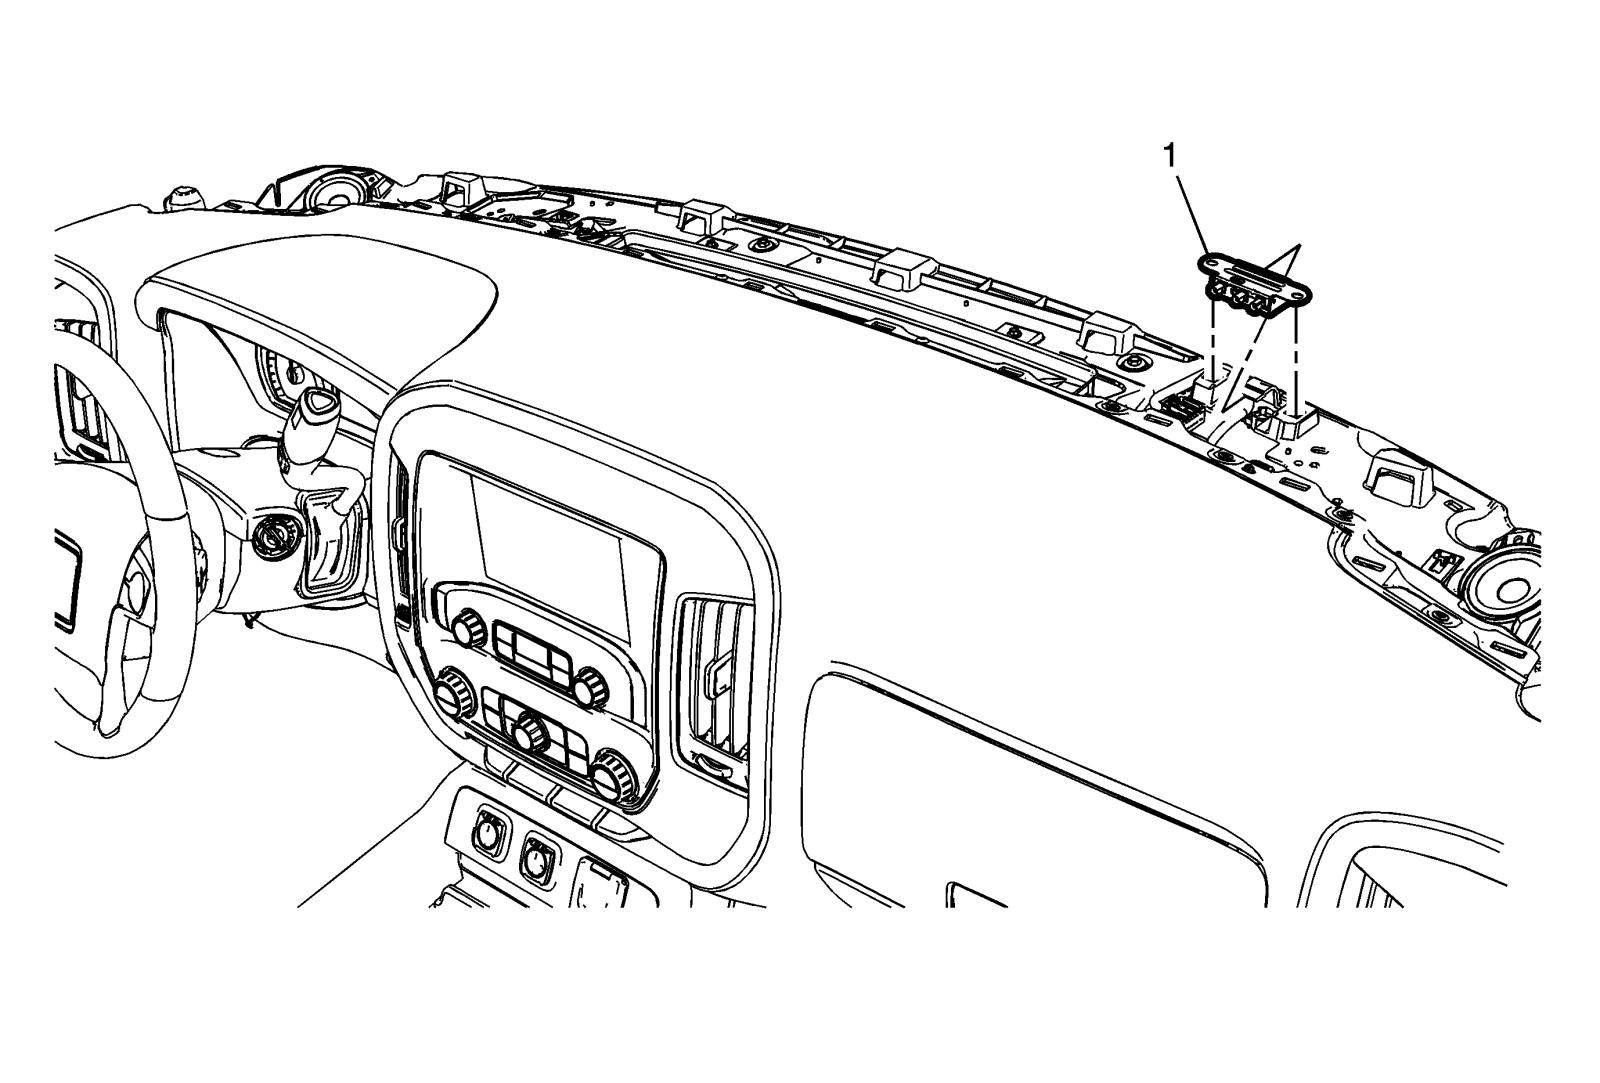 Upgrading an IO5 Non-Navigation Radio to an IO6 Navigation